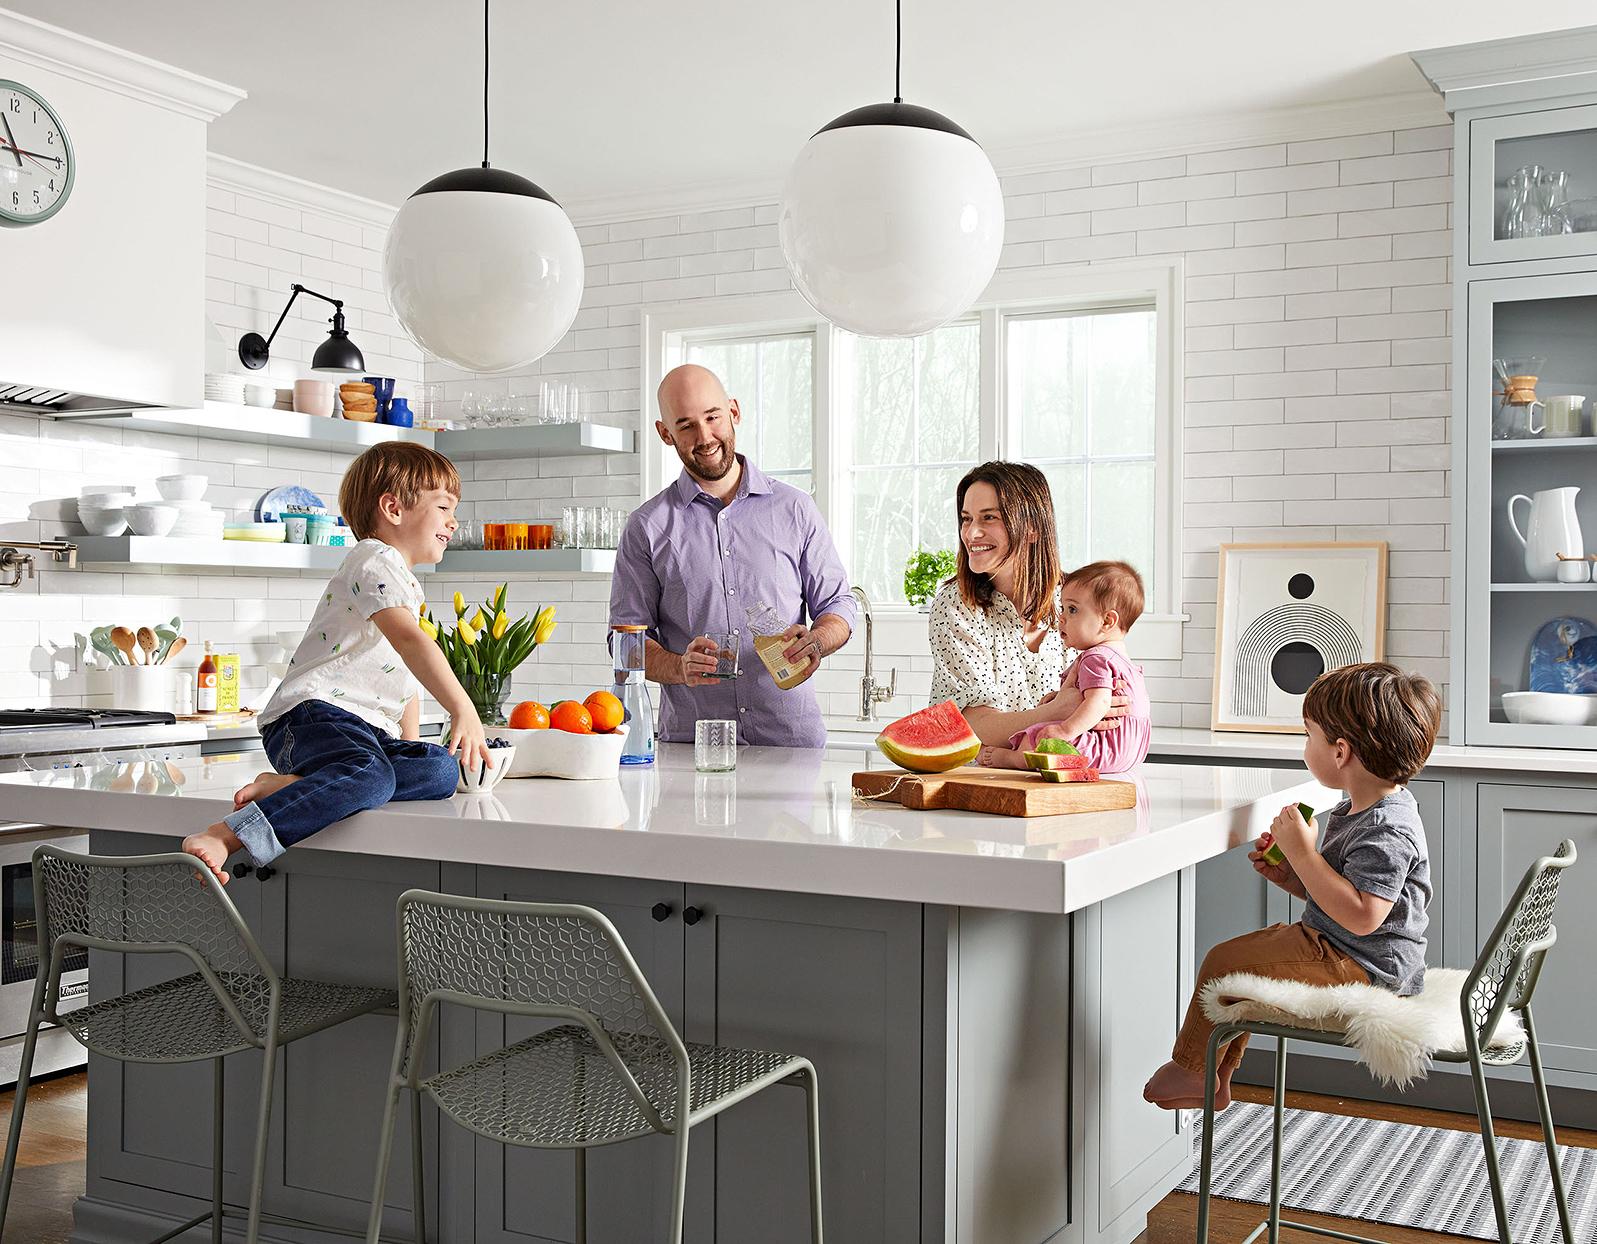 family smiling kids kitchen island fruit